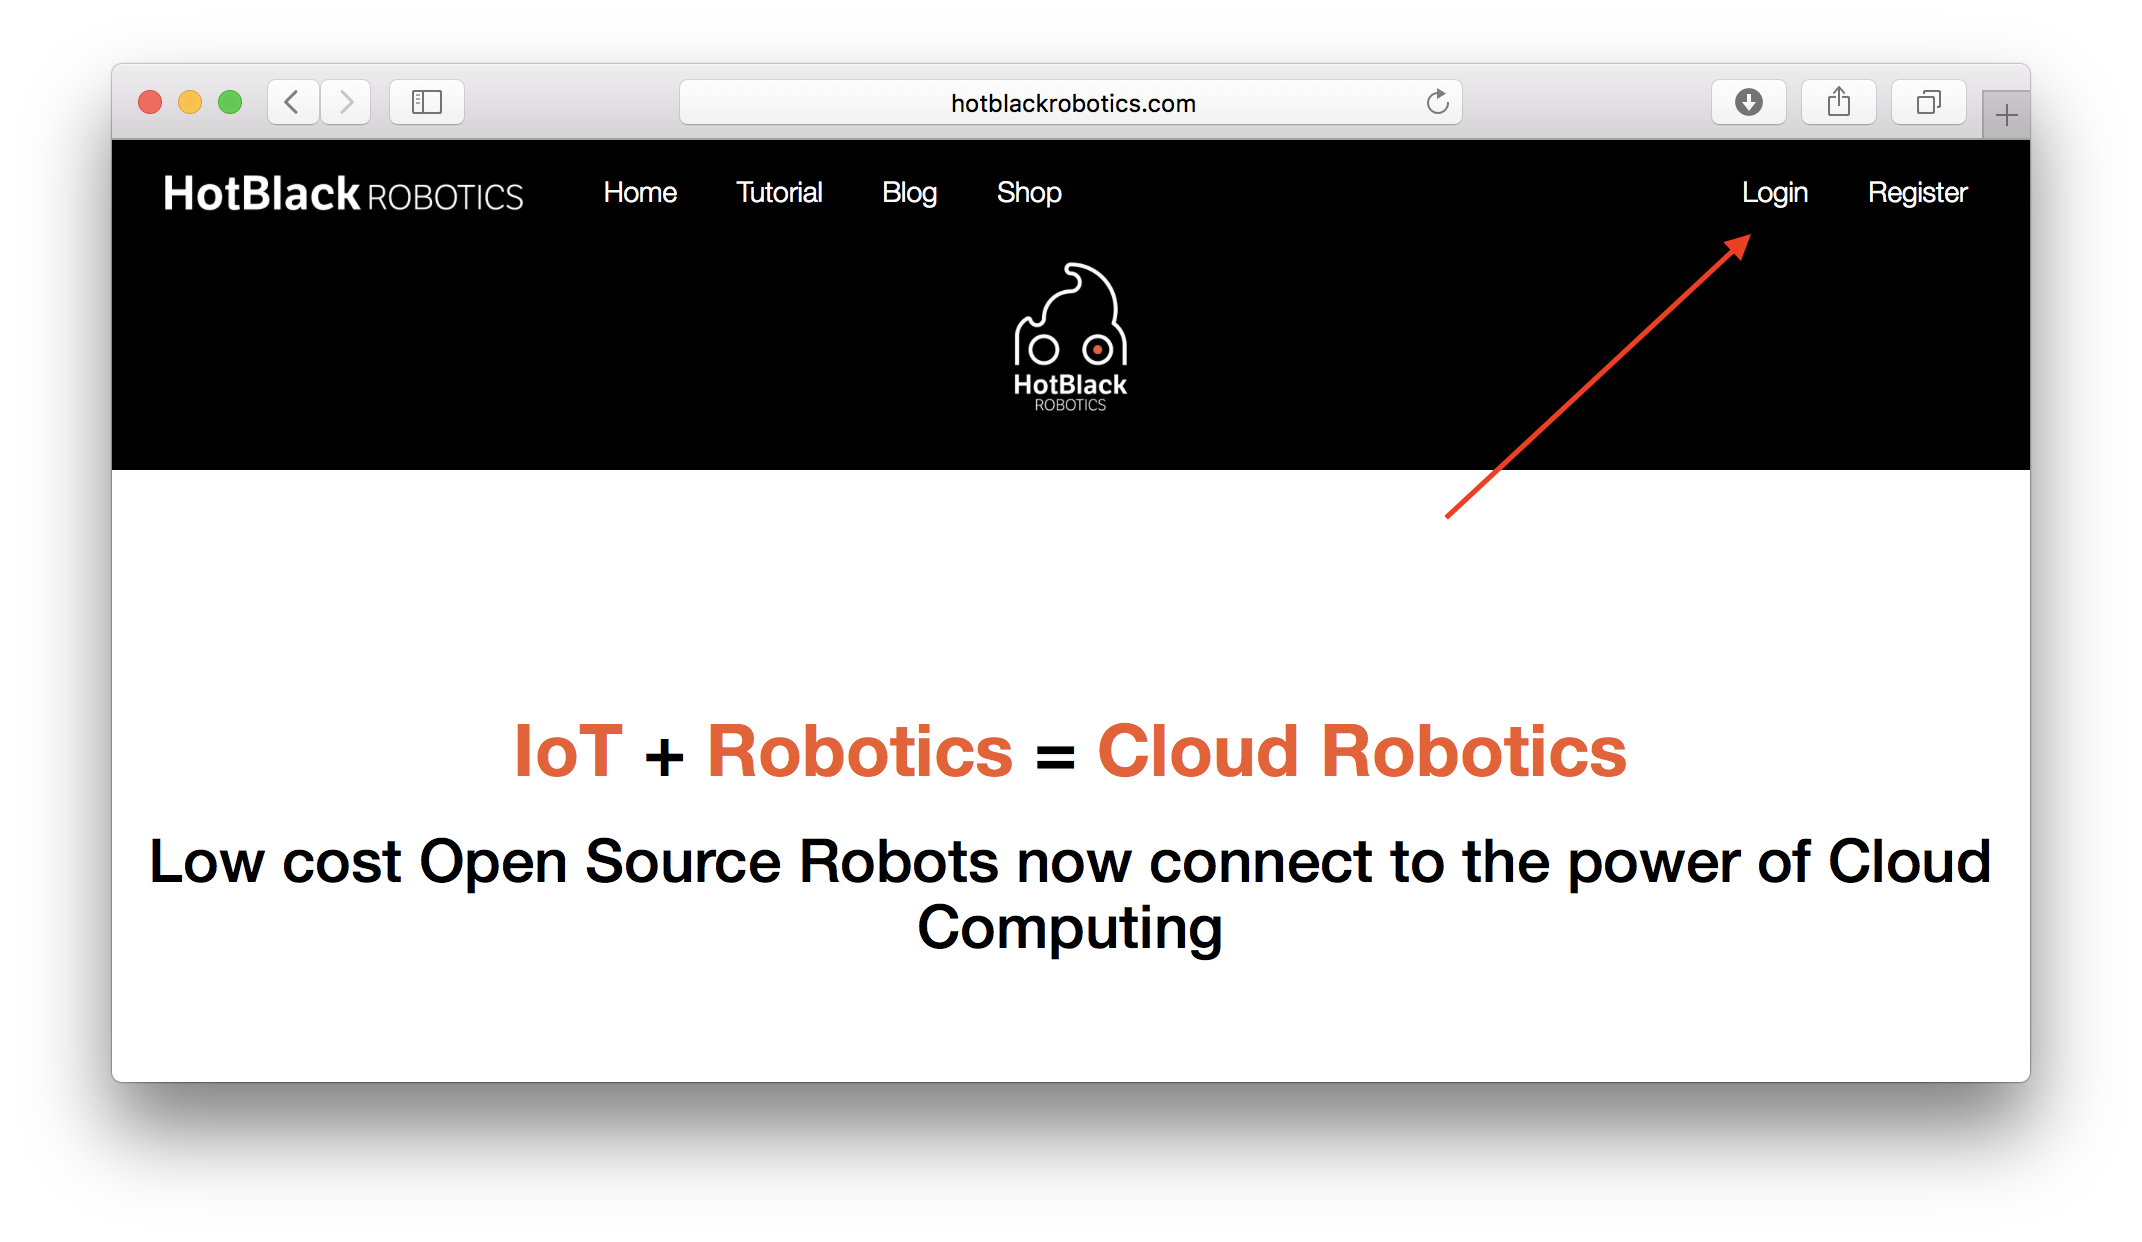 sito hotblack robotics